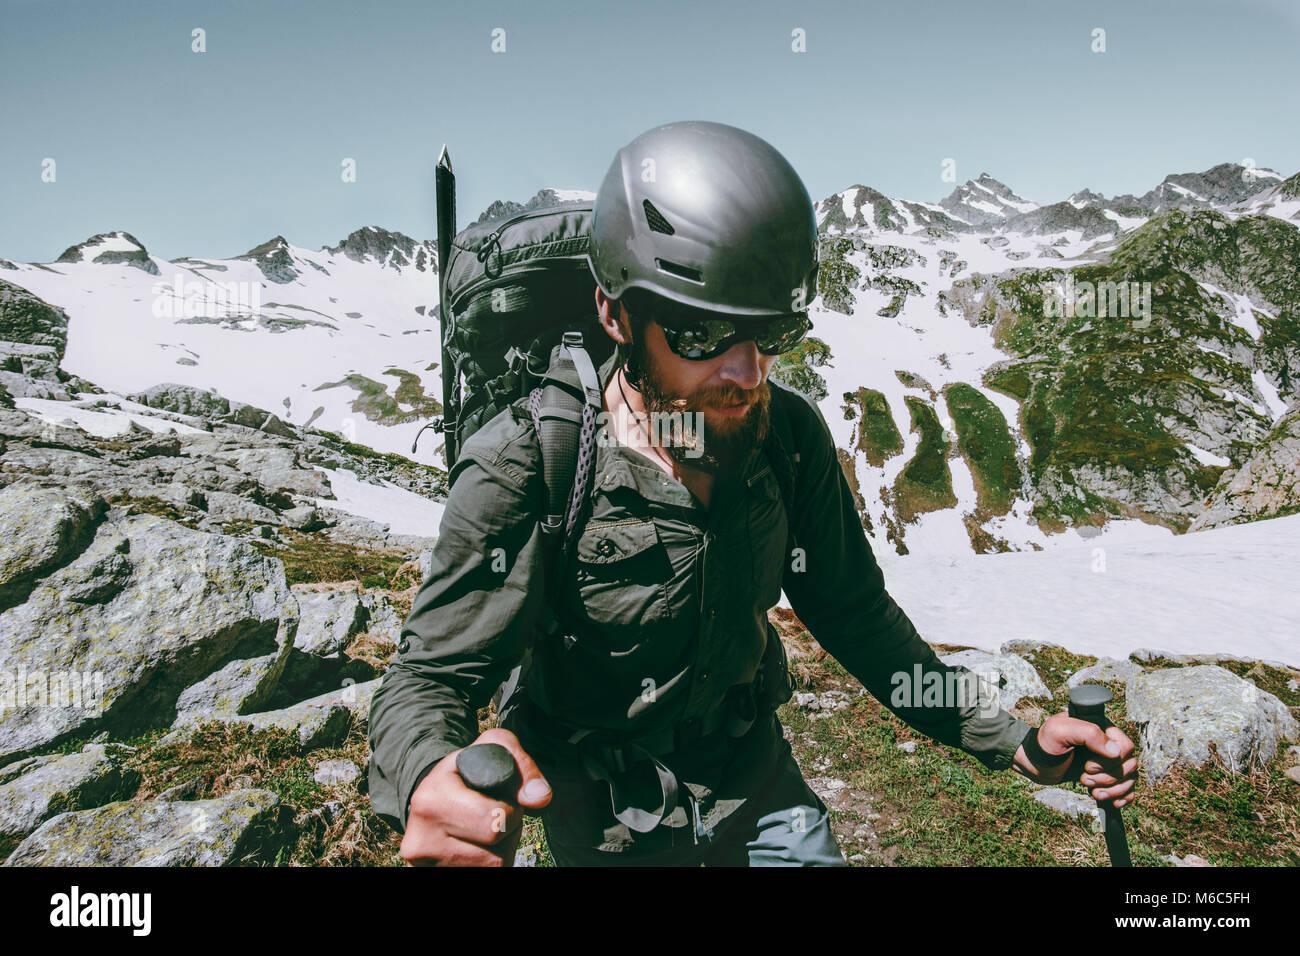 Hombre aventurero con mochila de viaje expedición escalando montañas supervivencia concepto de estilo Imagen De Stock